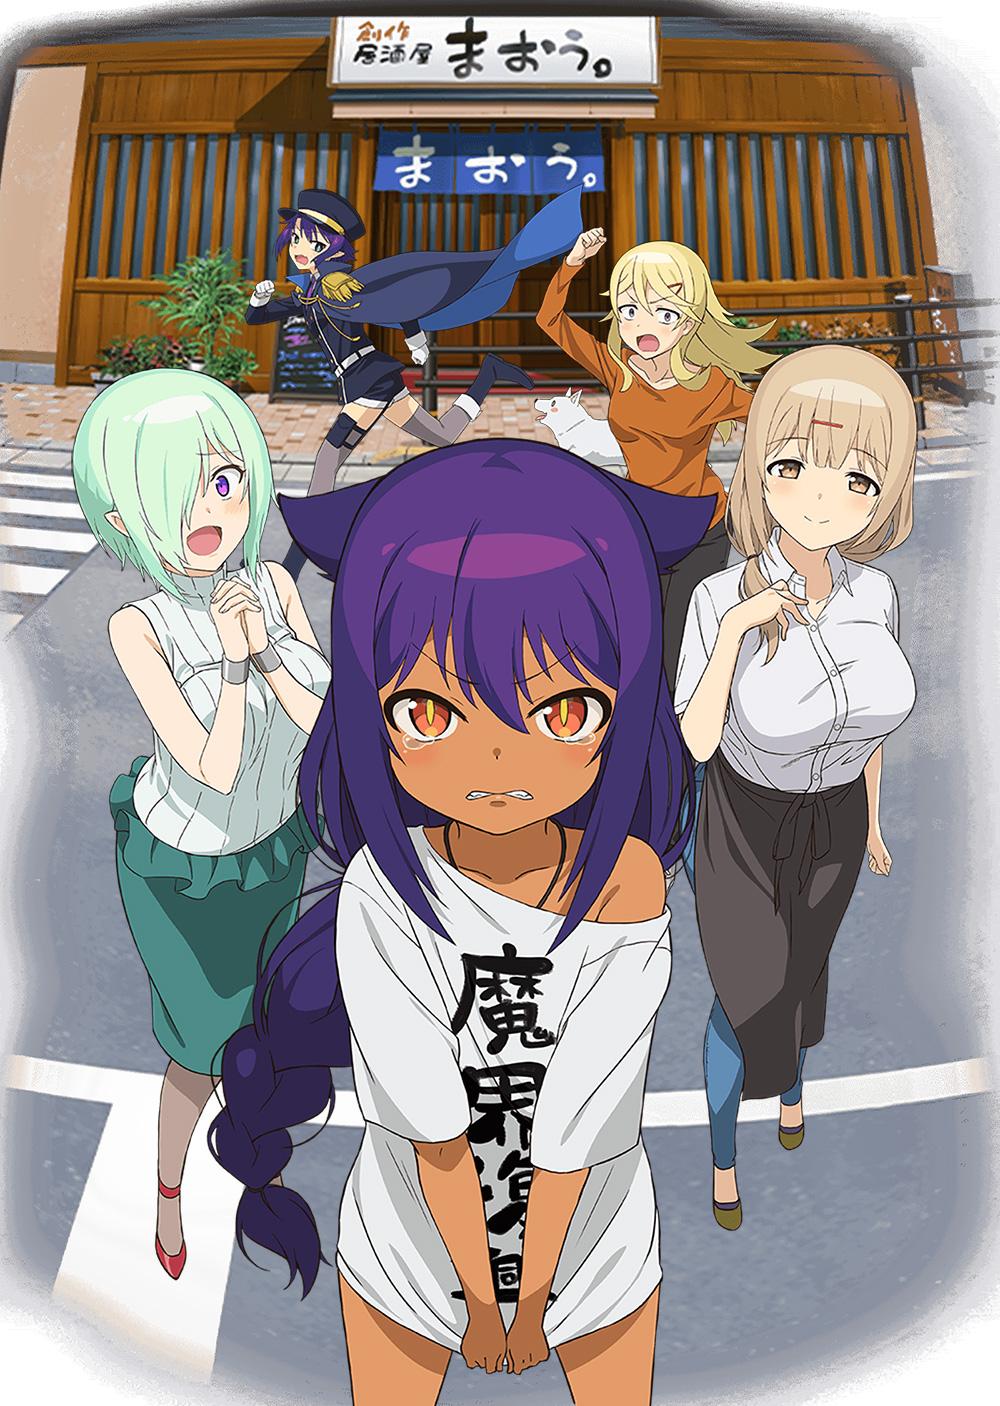 Jahy-sama-wa-Kujikenai!-TV-Anime-Visual